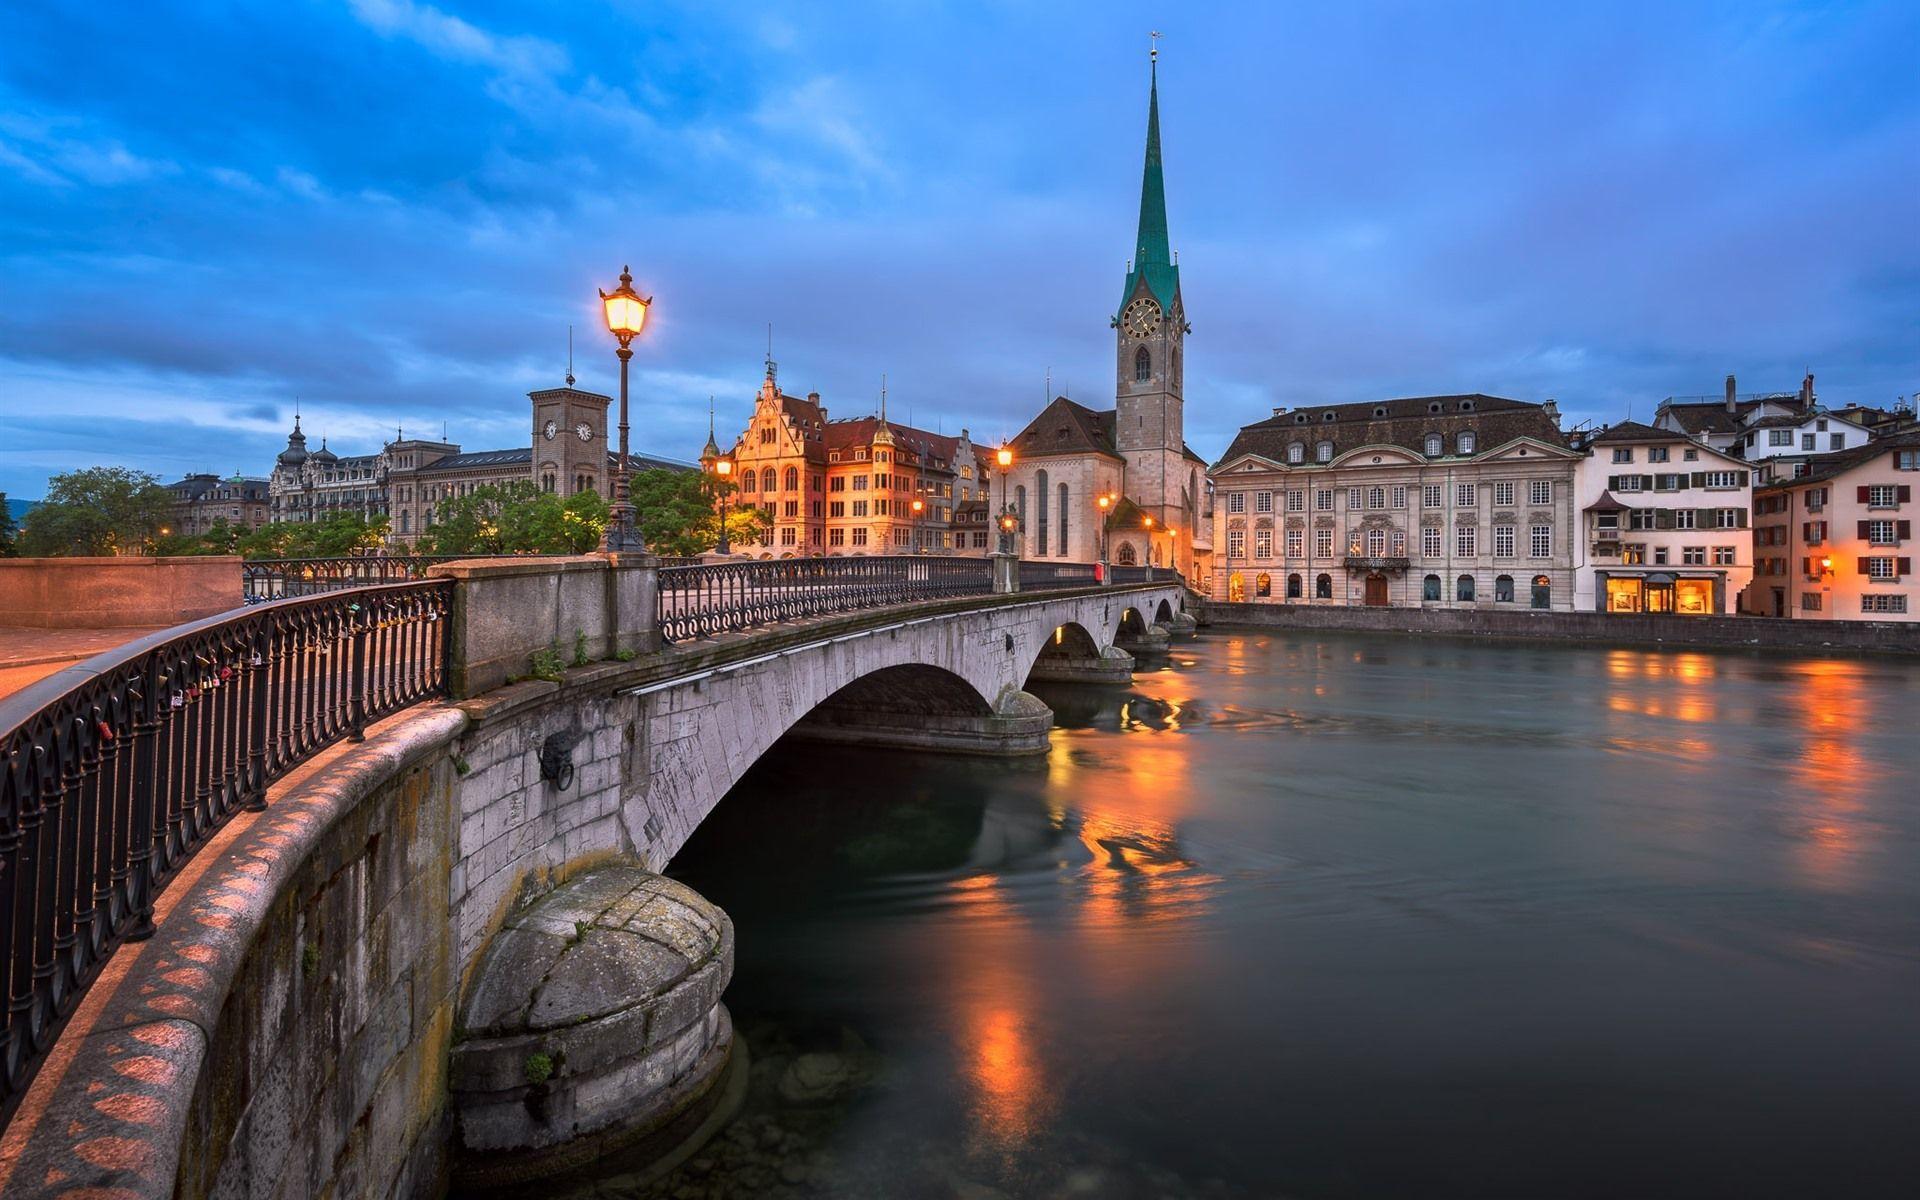 Zurich Wallpapers - Top Free Zurich Backgrounds - WallpaperAccess